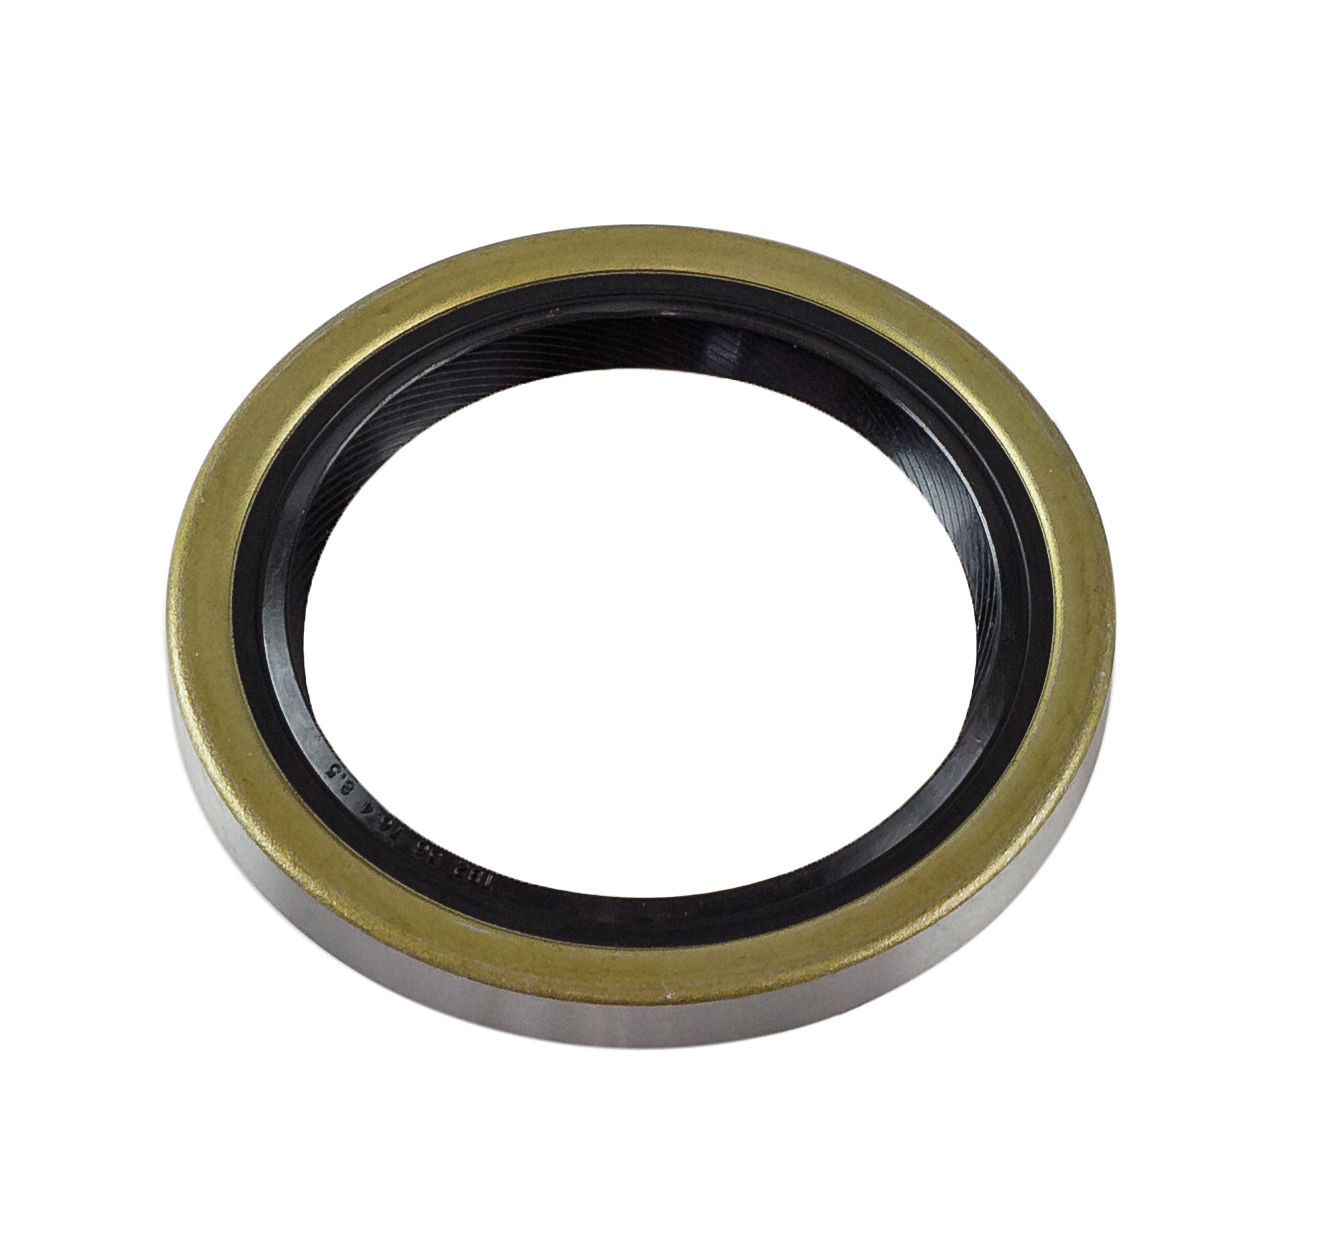 Kardan Oil Seal MerCruiser Alpha G2, OMAX Supplier